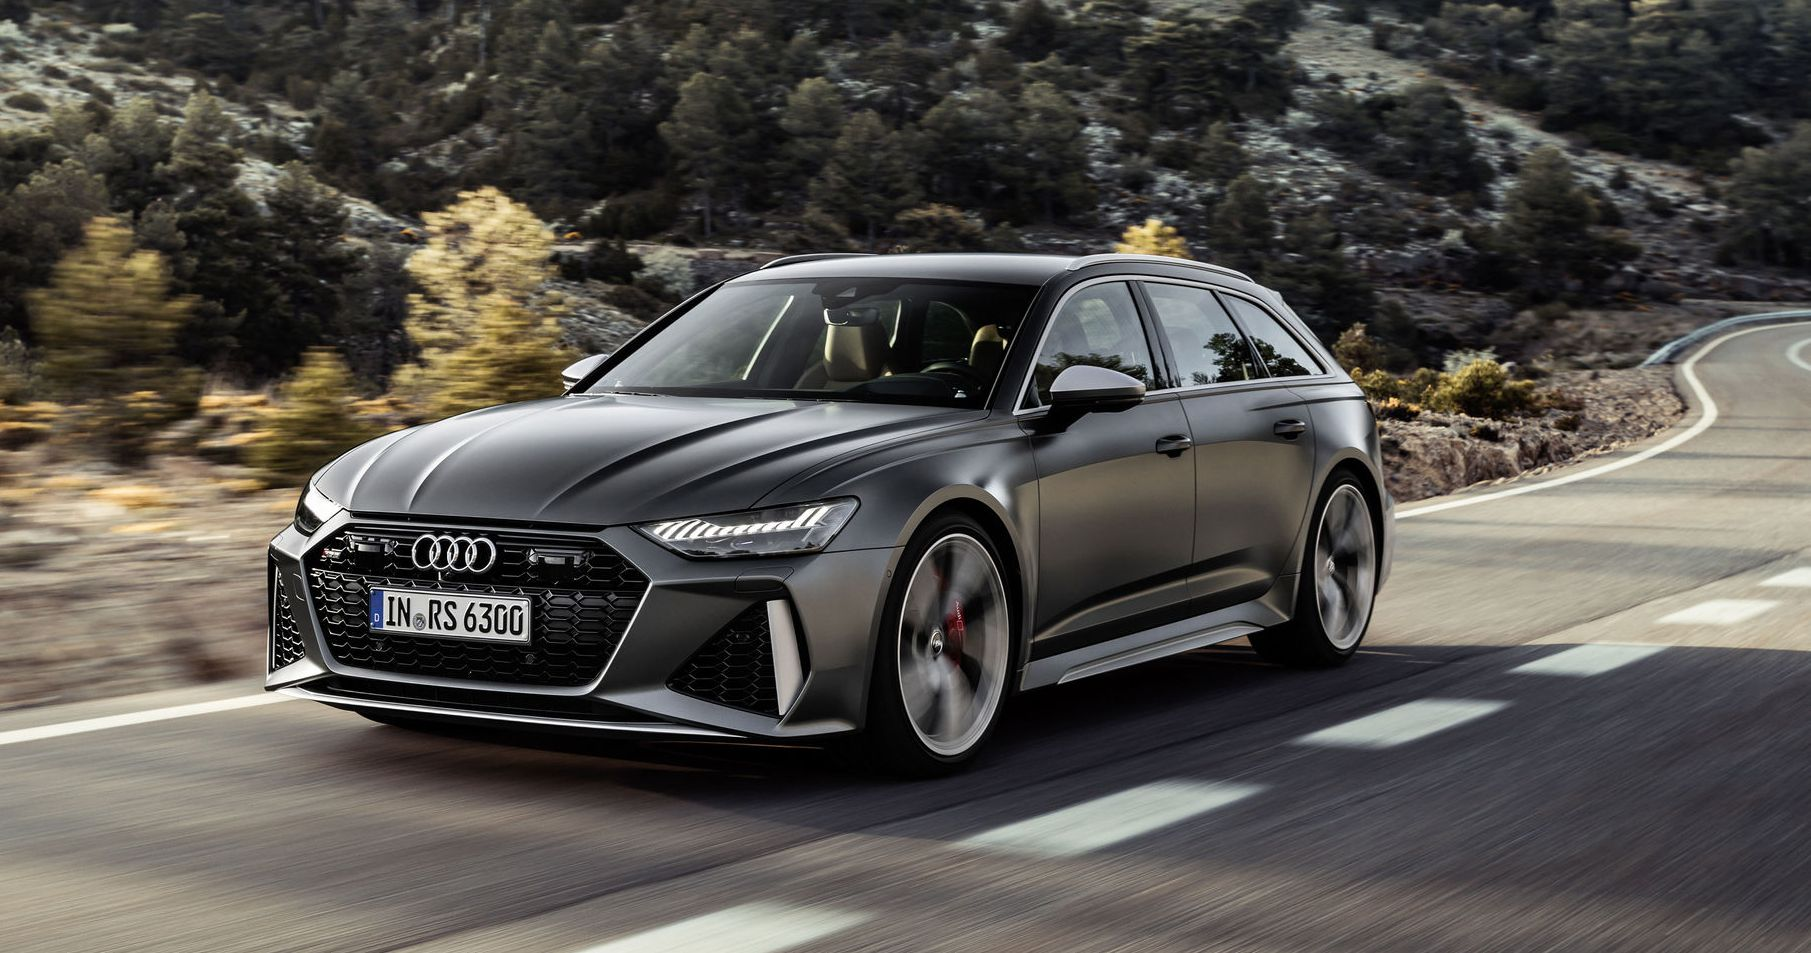 Starbucks, Anyone? 9 Audi RS9 Avant To Make Debut At ... | who make audi cars